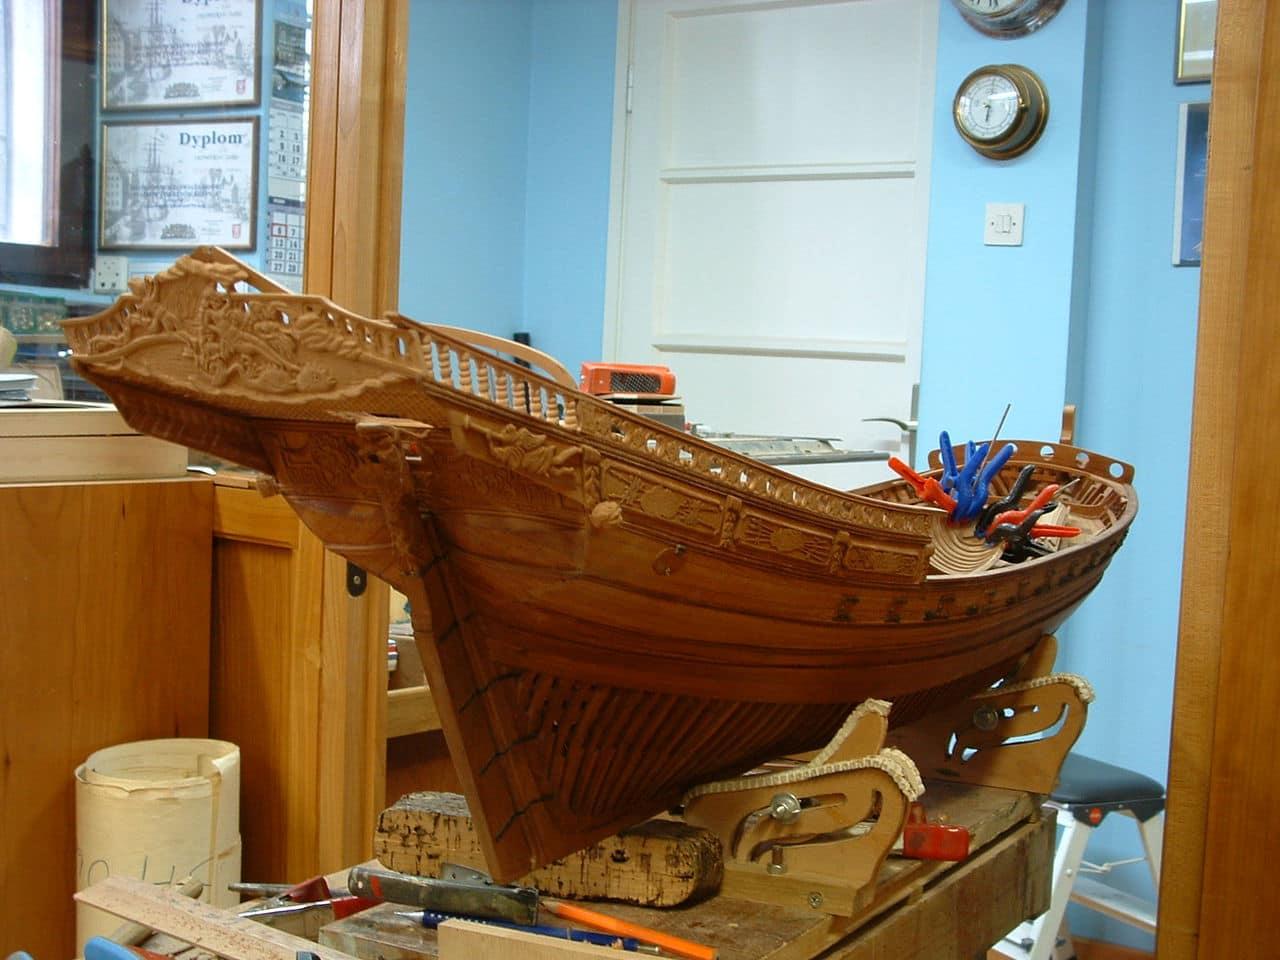 Chebec Le Requin - 1750 1188